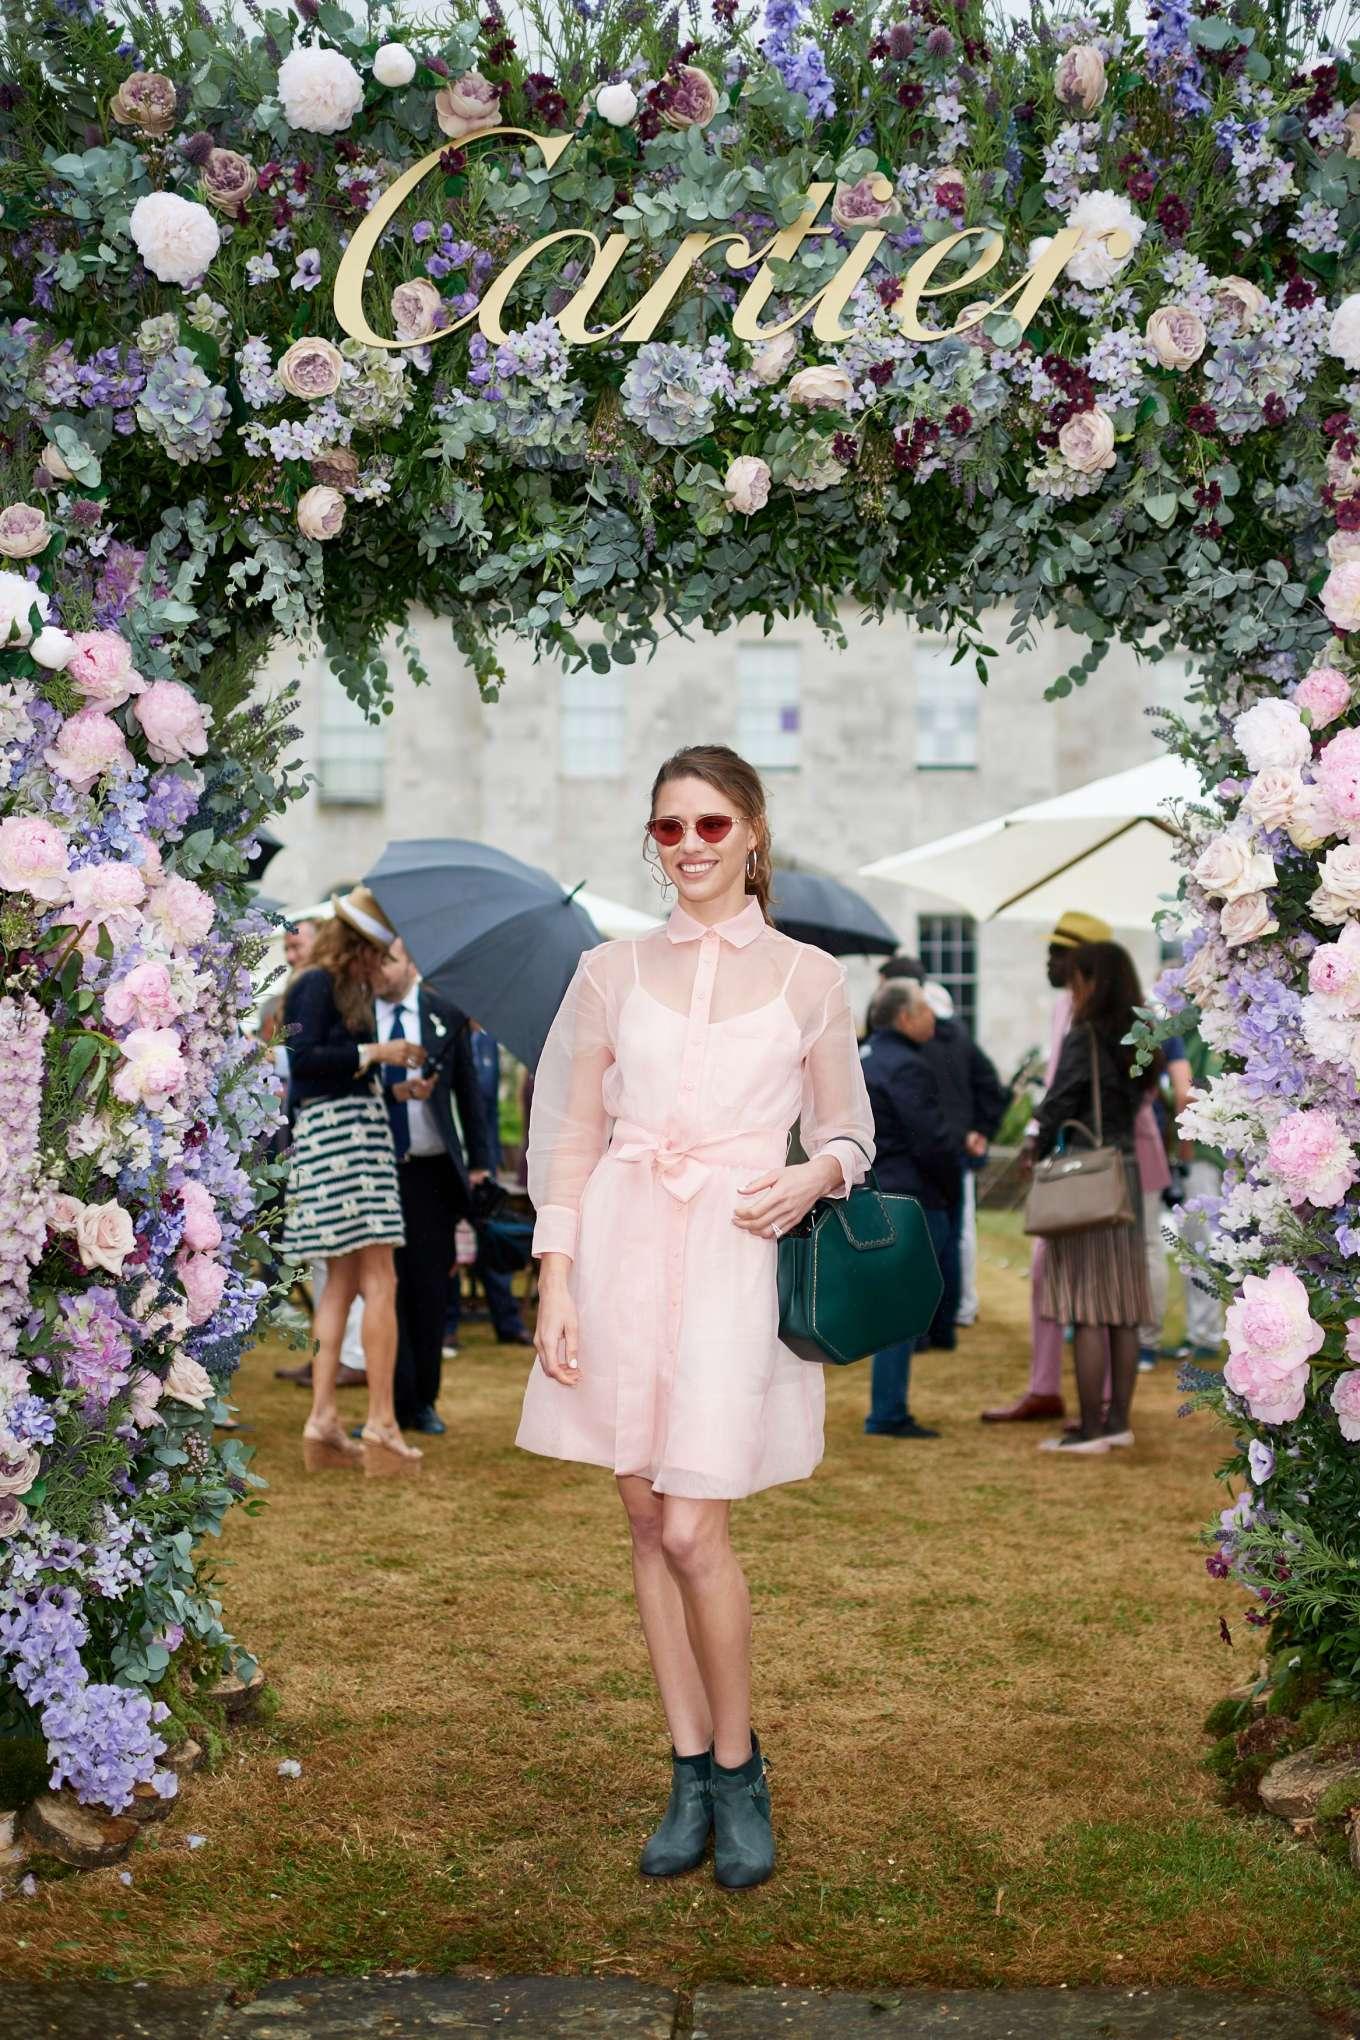 Alessandra Balazs 2019 : Alessandra Balazs – 2019 Goodwood Festival of Speed Cartier Style Et Luxe Enclosure-01